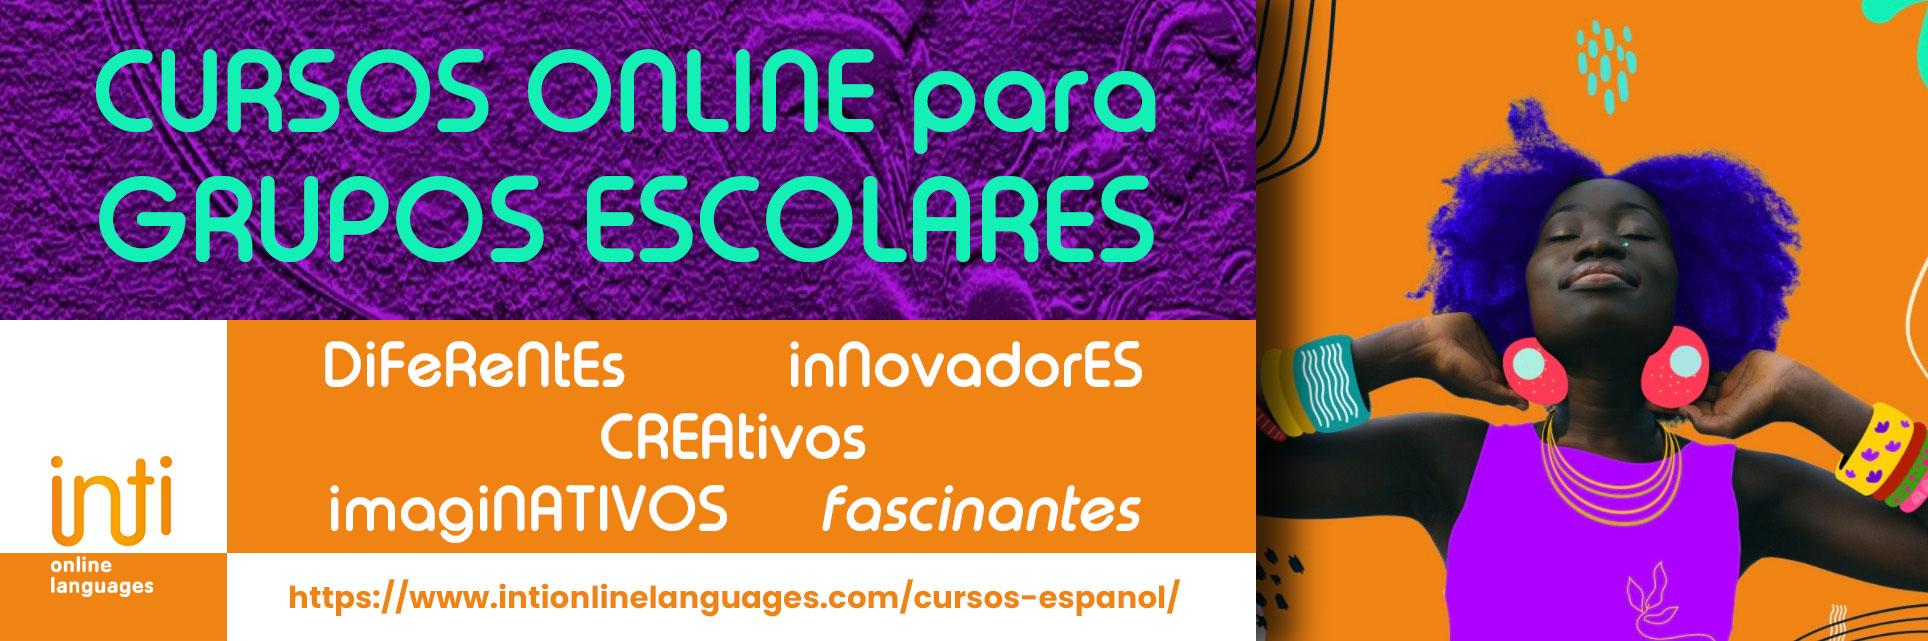 inti - Cursos online para grupos escolares